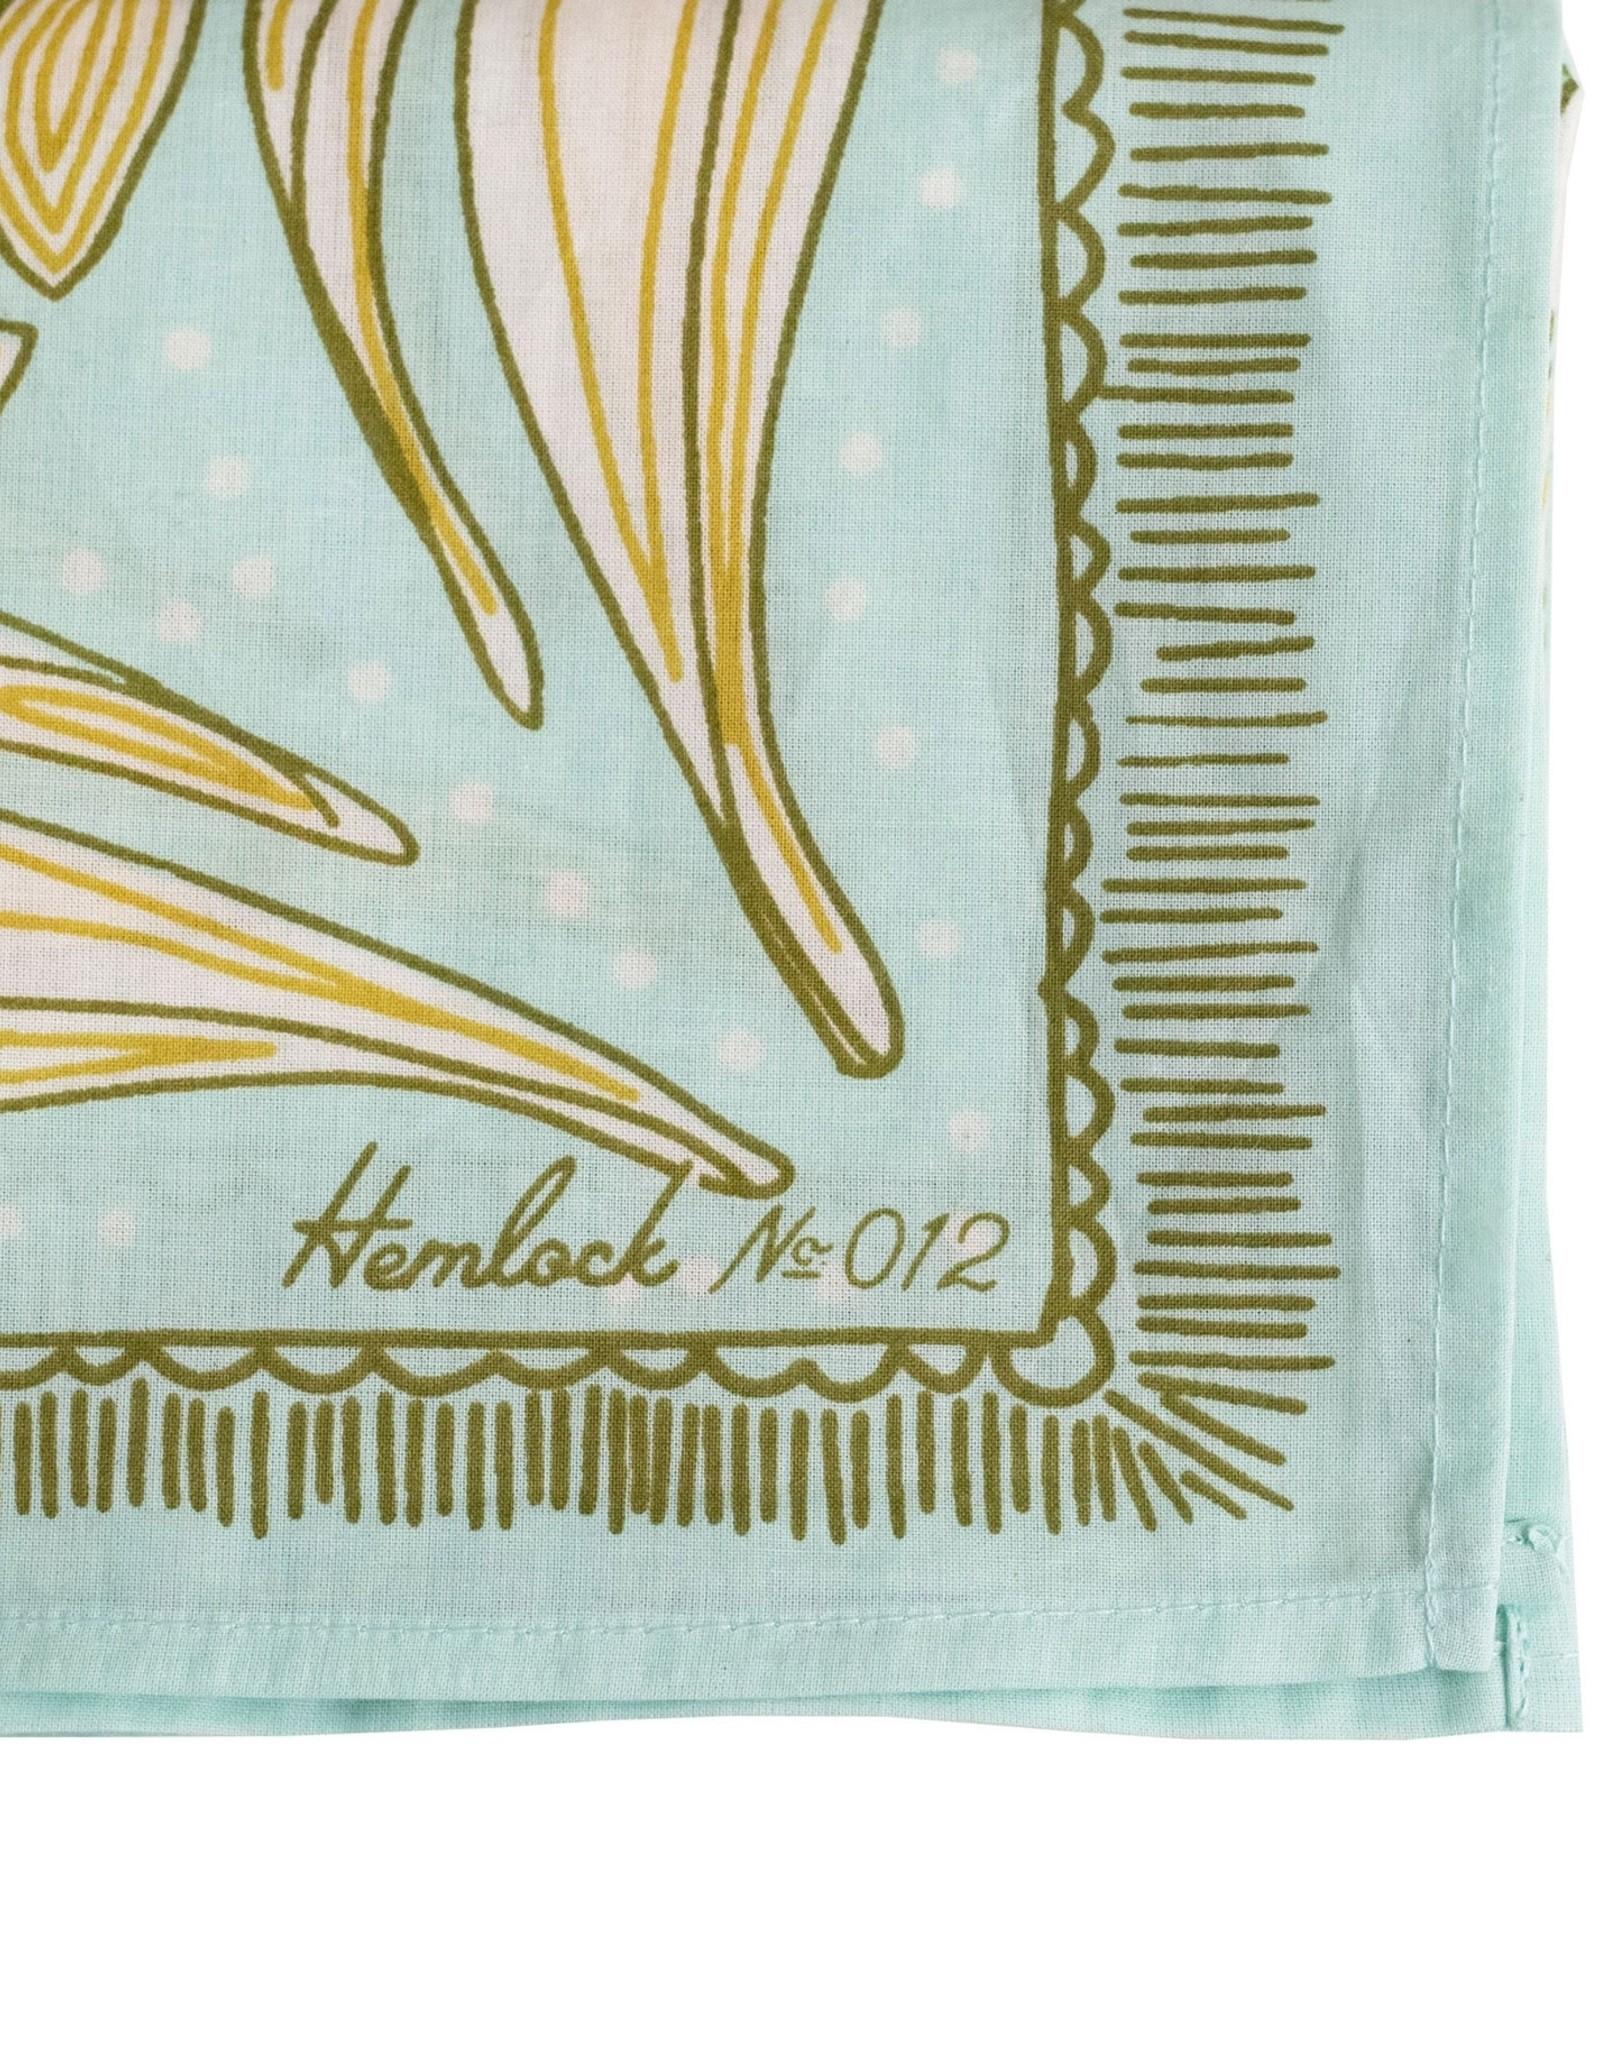 Hemlock Hemlock Bandana